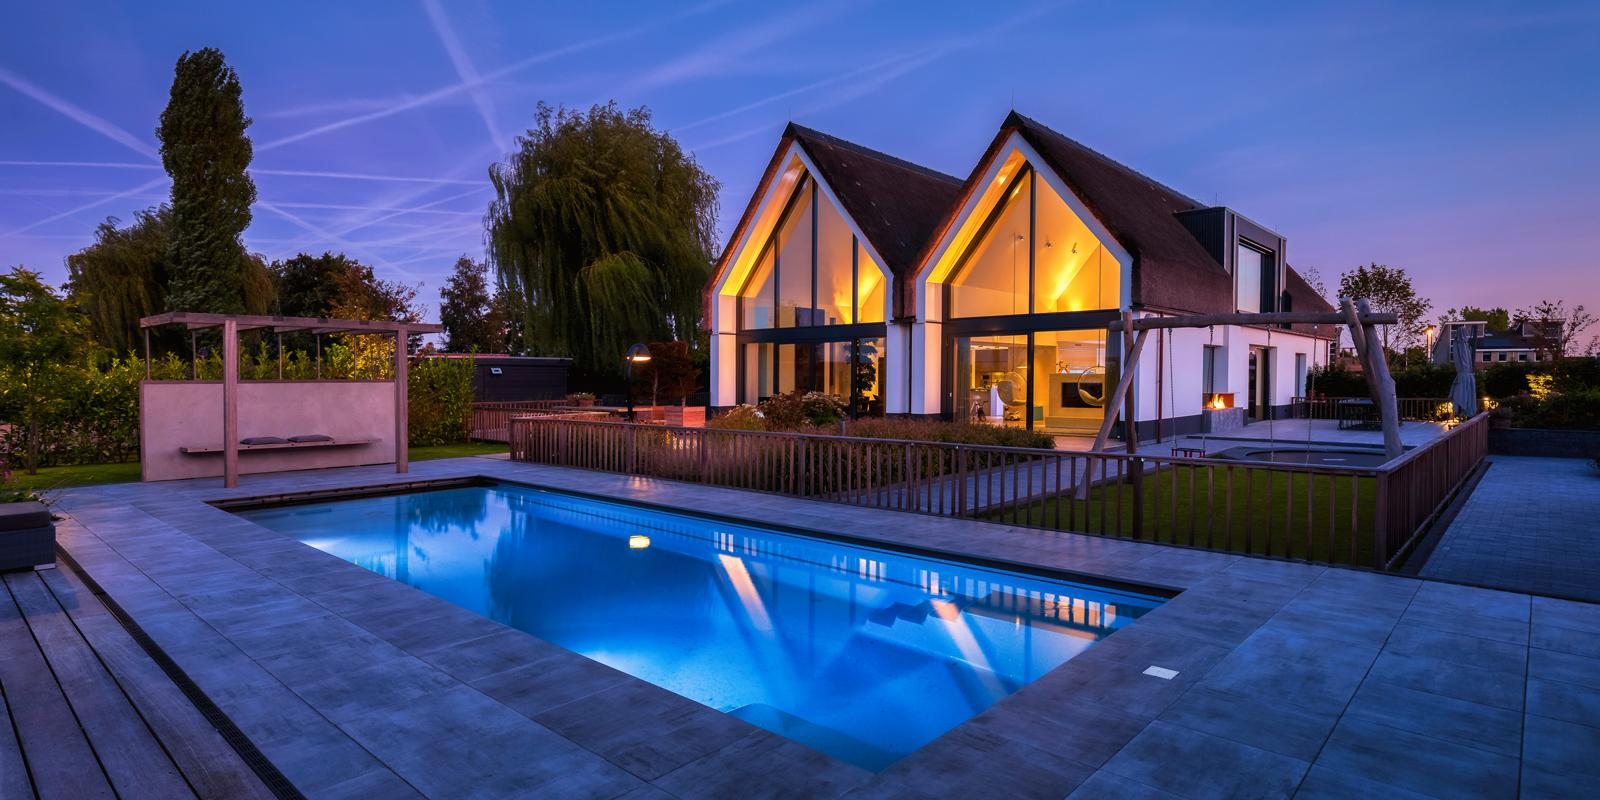 zwembad in de tuin, compass pools, the art of living